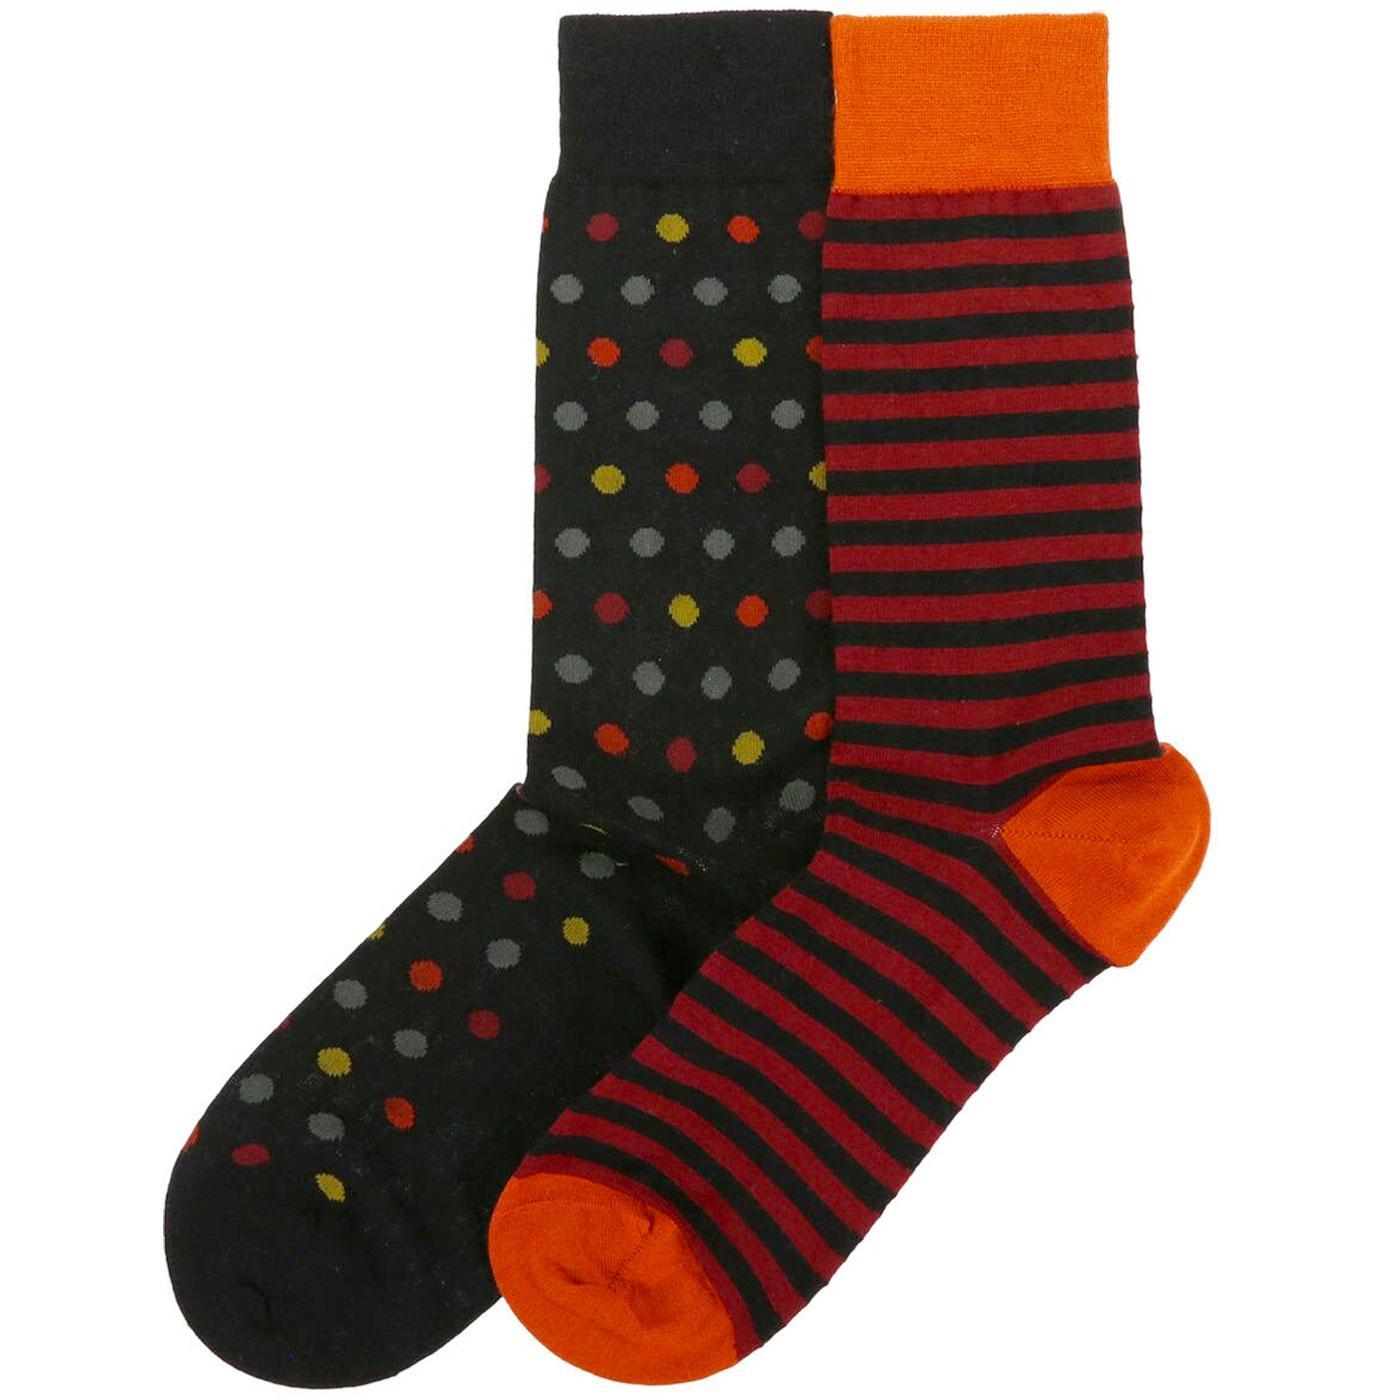 PANTHERELLA Spots & Stripes Merino Socks Gift Set